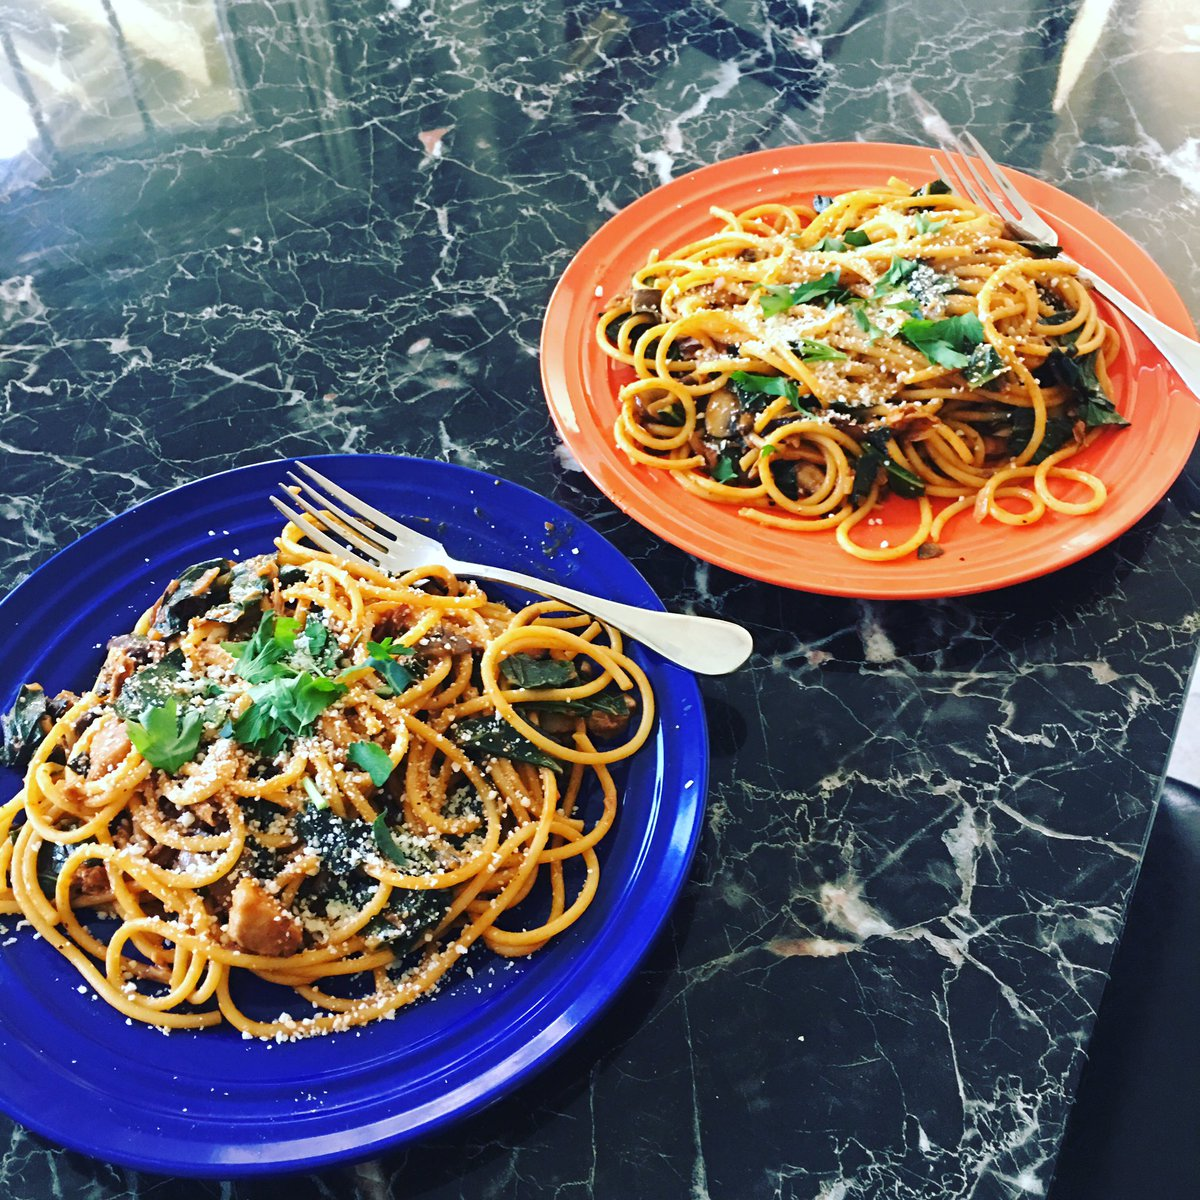 Blue apron bucatini - Jeremy Dooley On Twitter Tonight S Blueapron Is Mixed Mushroom Bucatini With Collard Greens Pecorino Cheese I Love Mushrooms So I M On Board